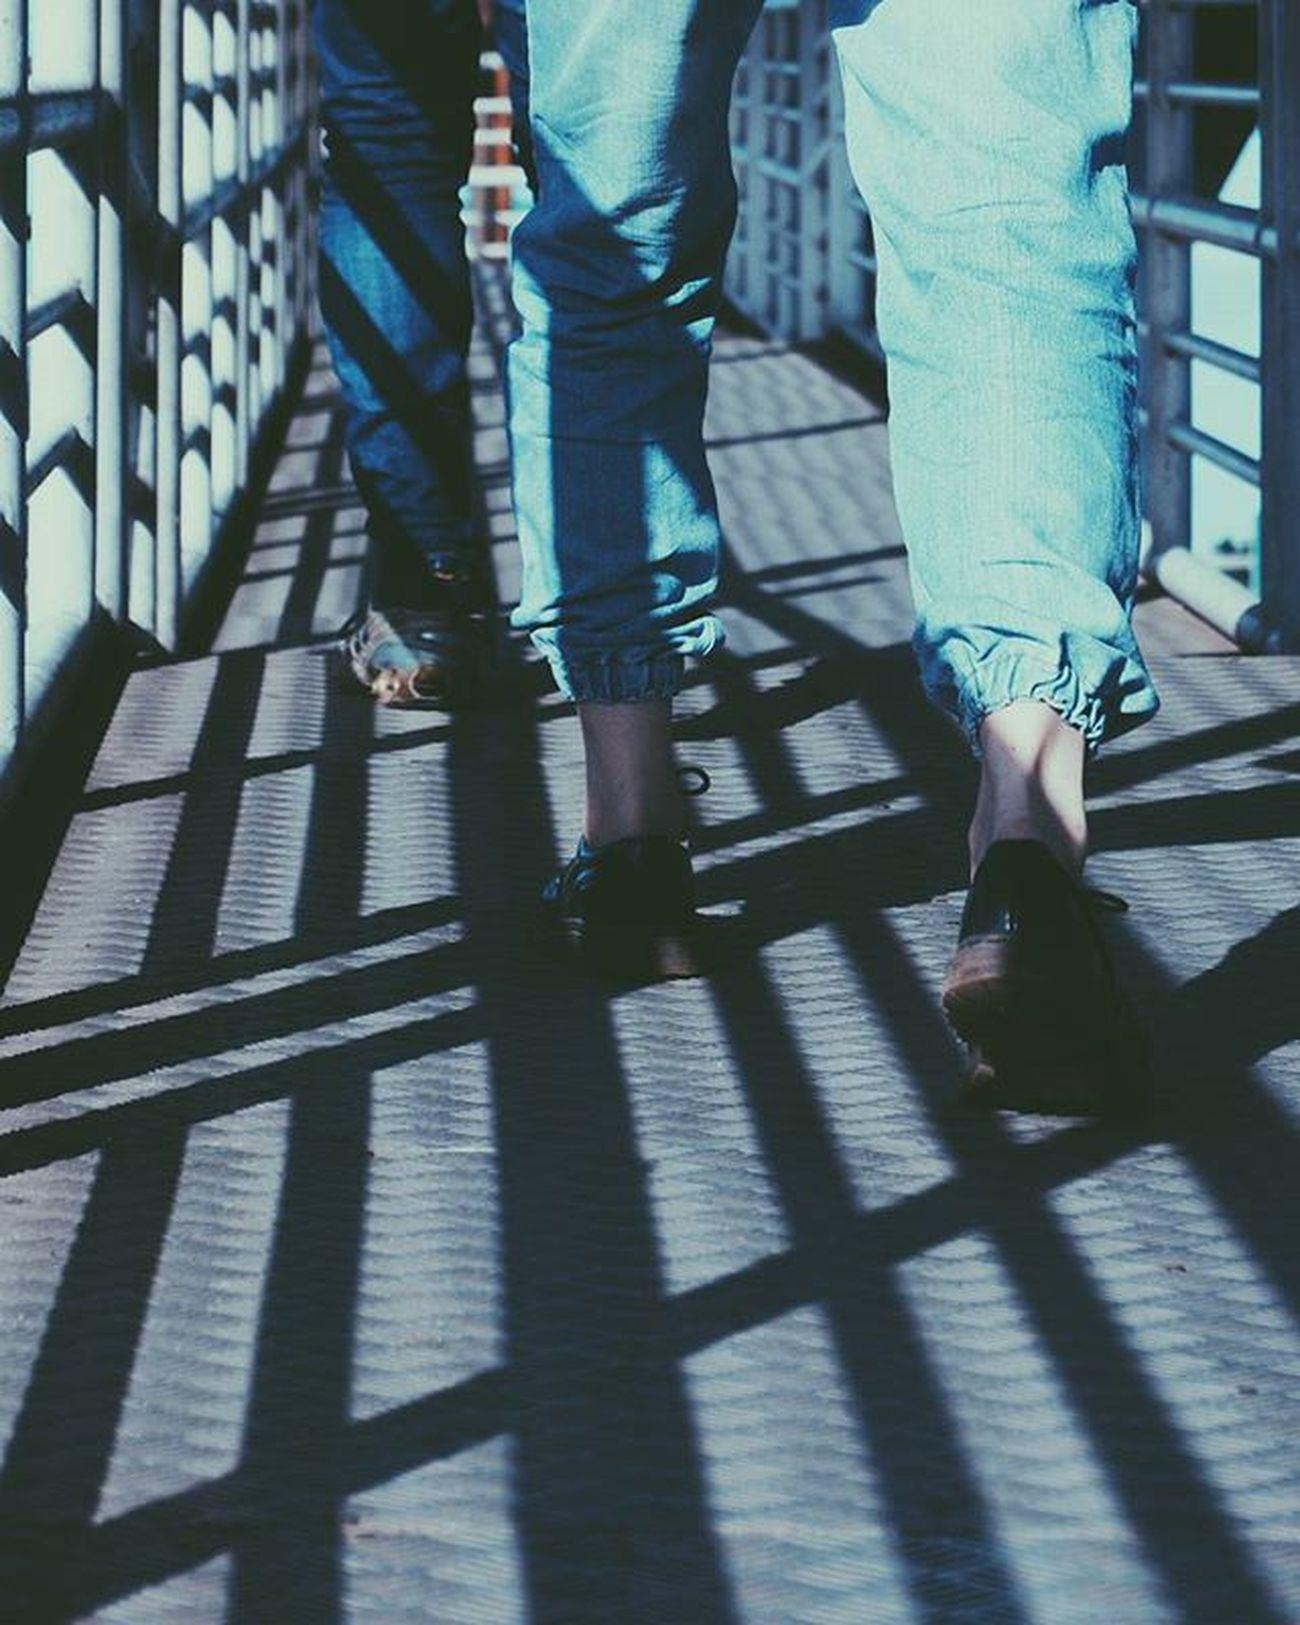 🚶 © Street Wear 1x5 Supreme Hypebeast  Streethunt Shadows Shadow Lines Black Jeans Blue INDONESIA Jakarta Explore P5 VSCO Vscoind Ootd Fashion Streetfashion Bottoms Shade Hip Photography